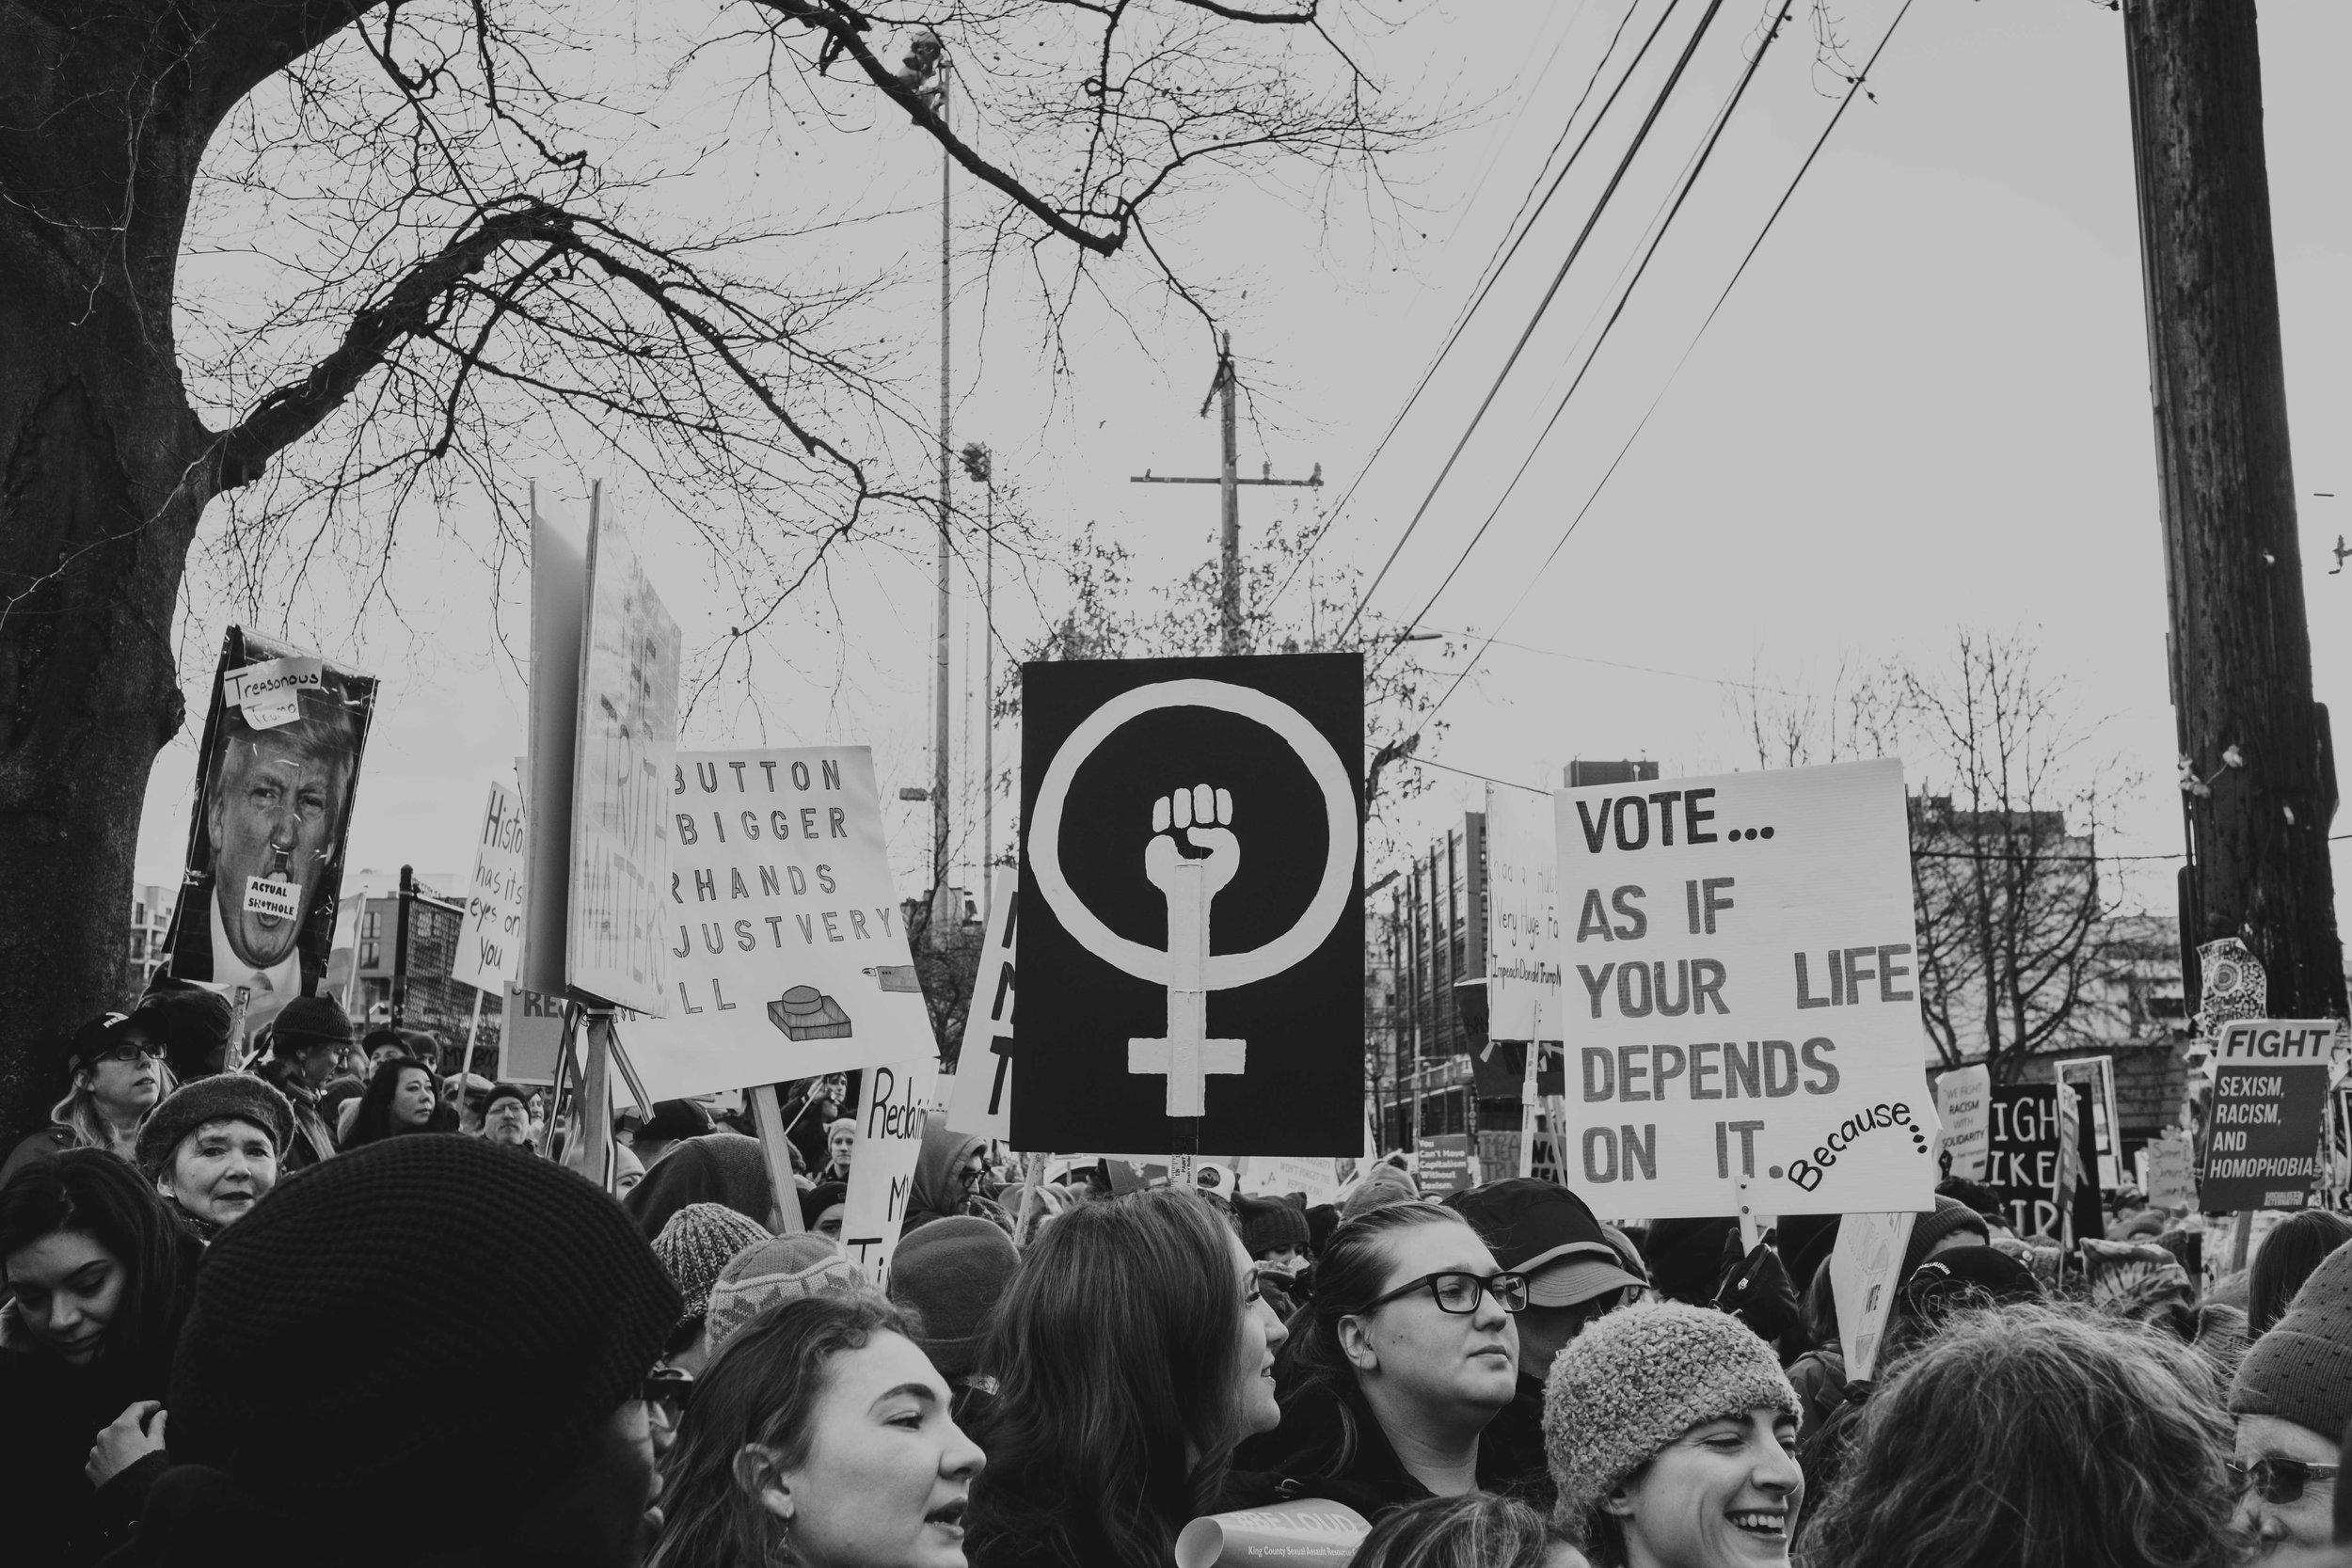 20180120_VanessaPatJack61_180120_WomensmarchSEA18.jpg